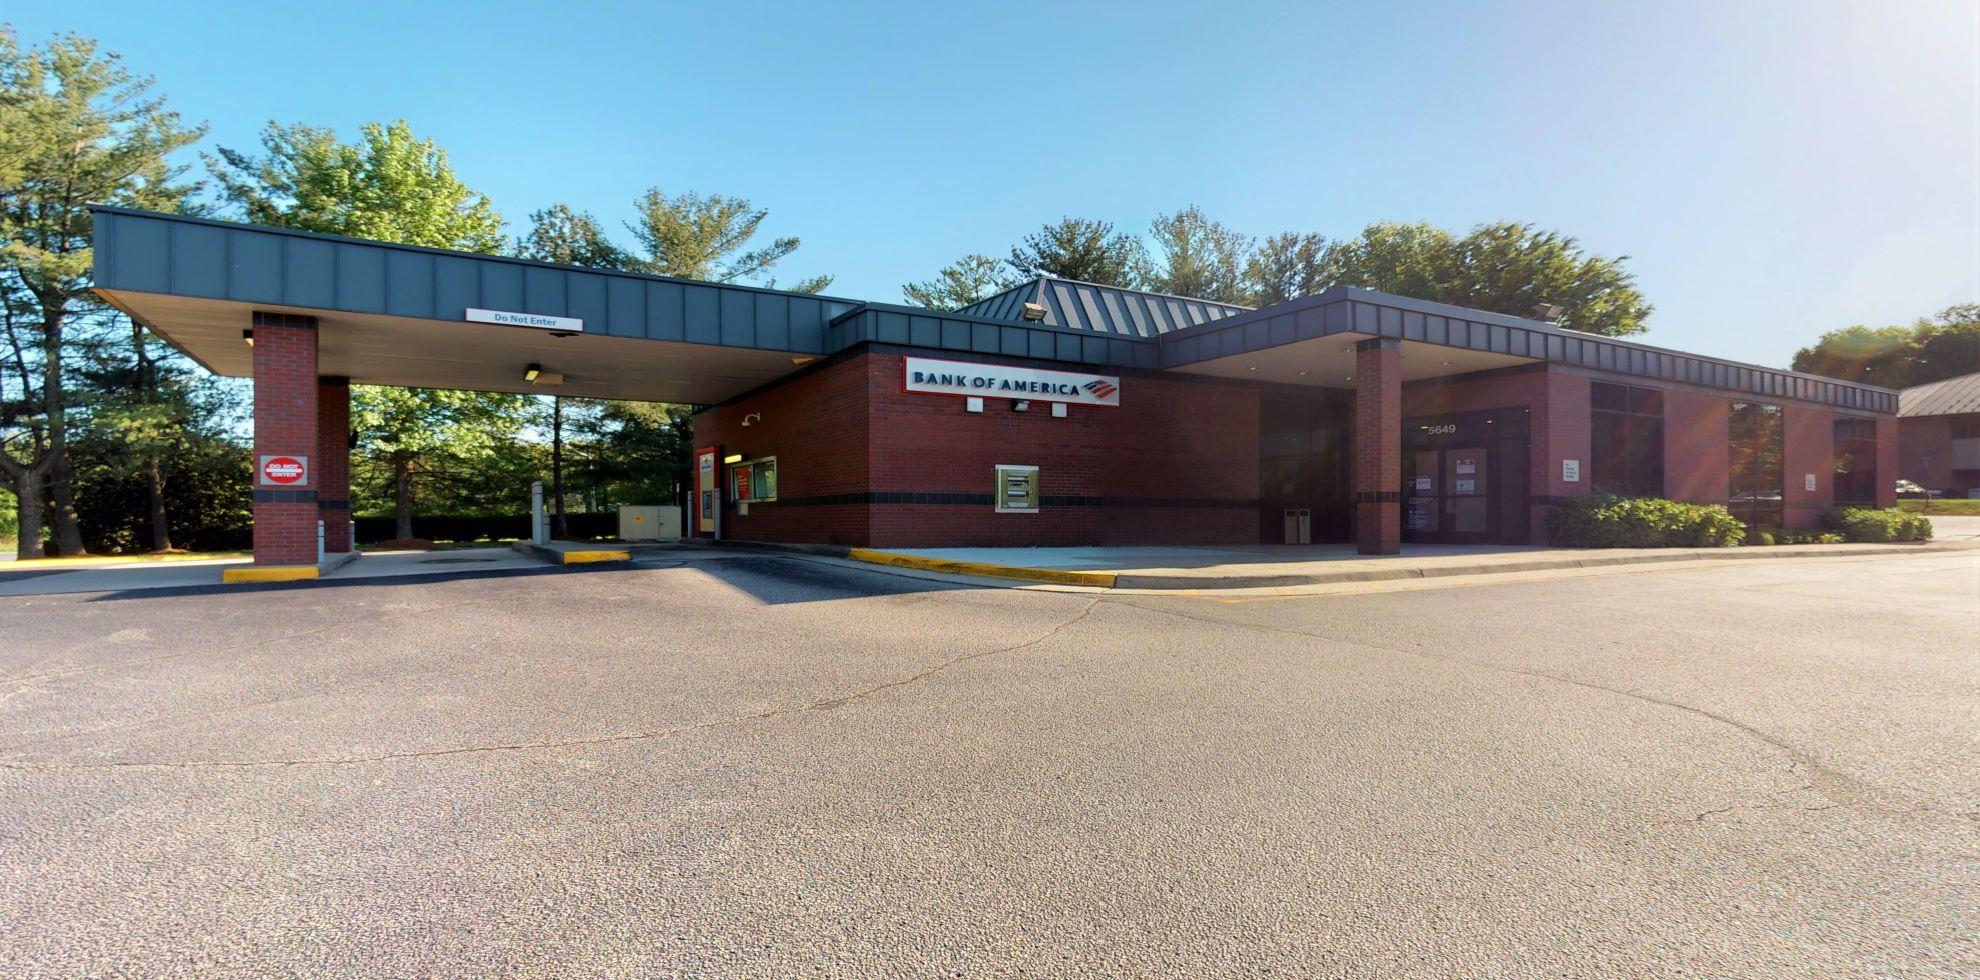 Bank of America financial center with drive-thru ATM | 5649 Burke Centre Pkwy, Burke, VA 22015